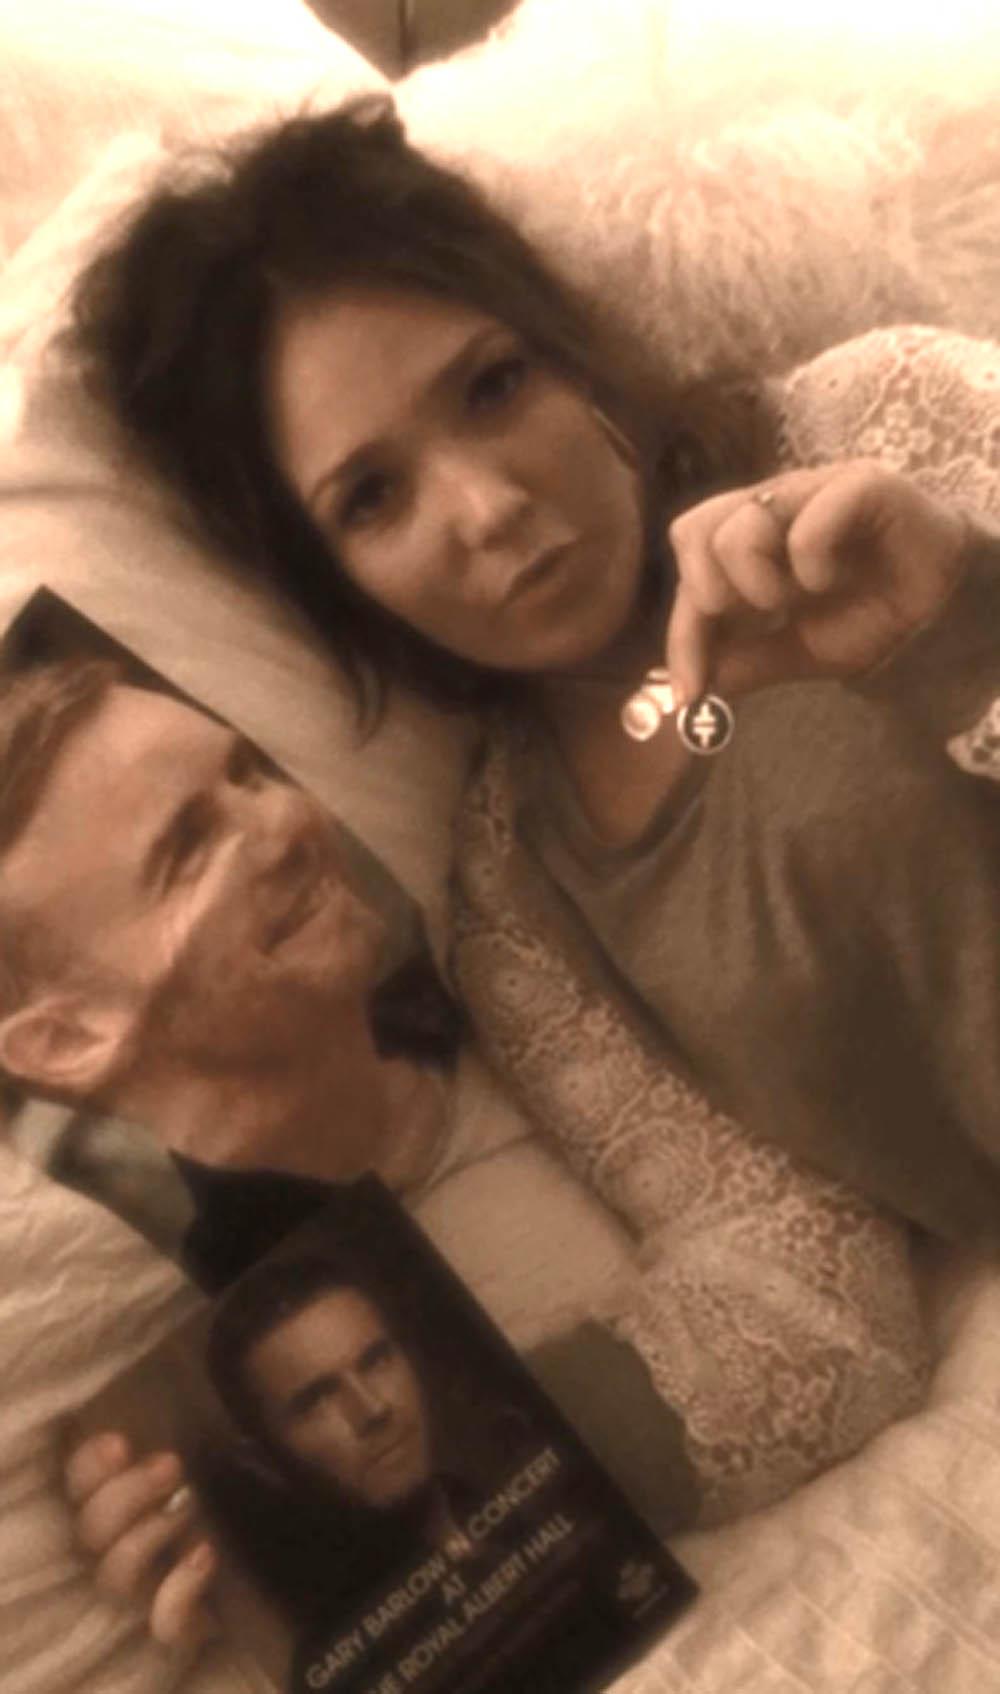 Barlow selfie